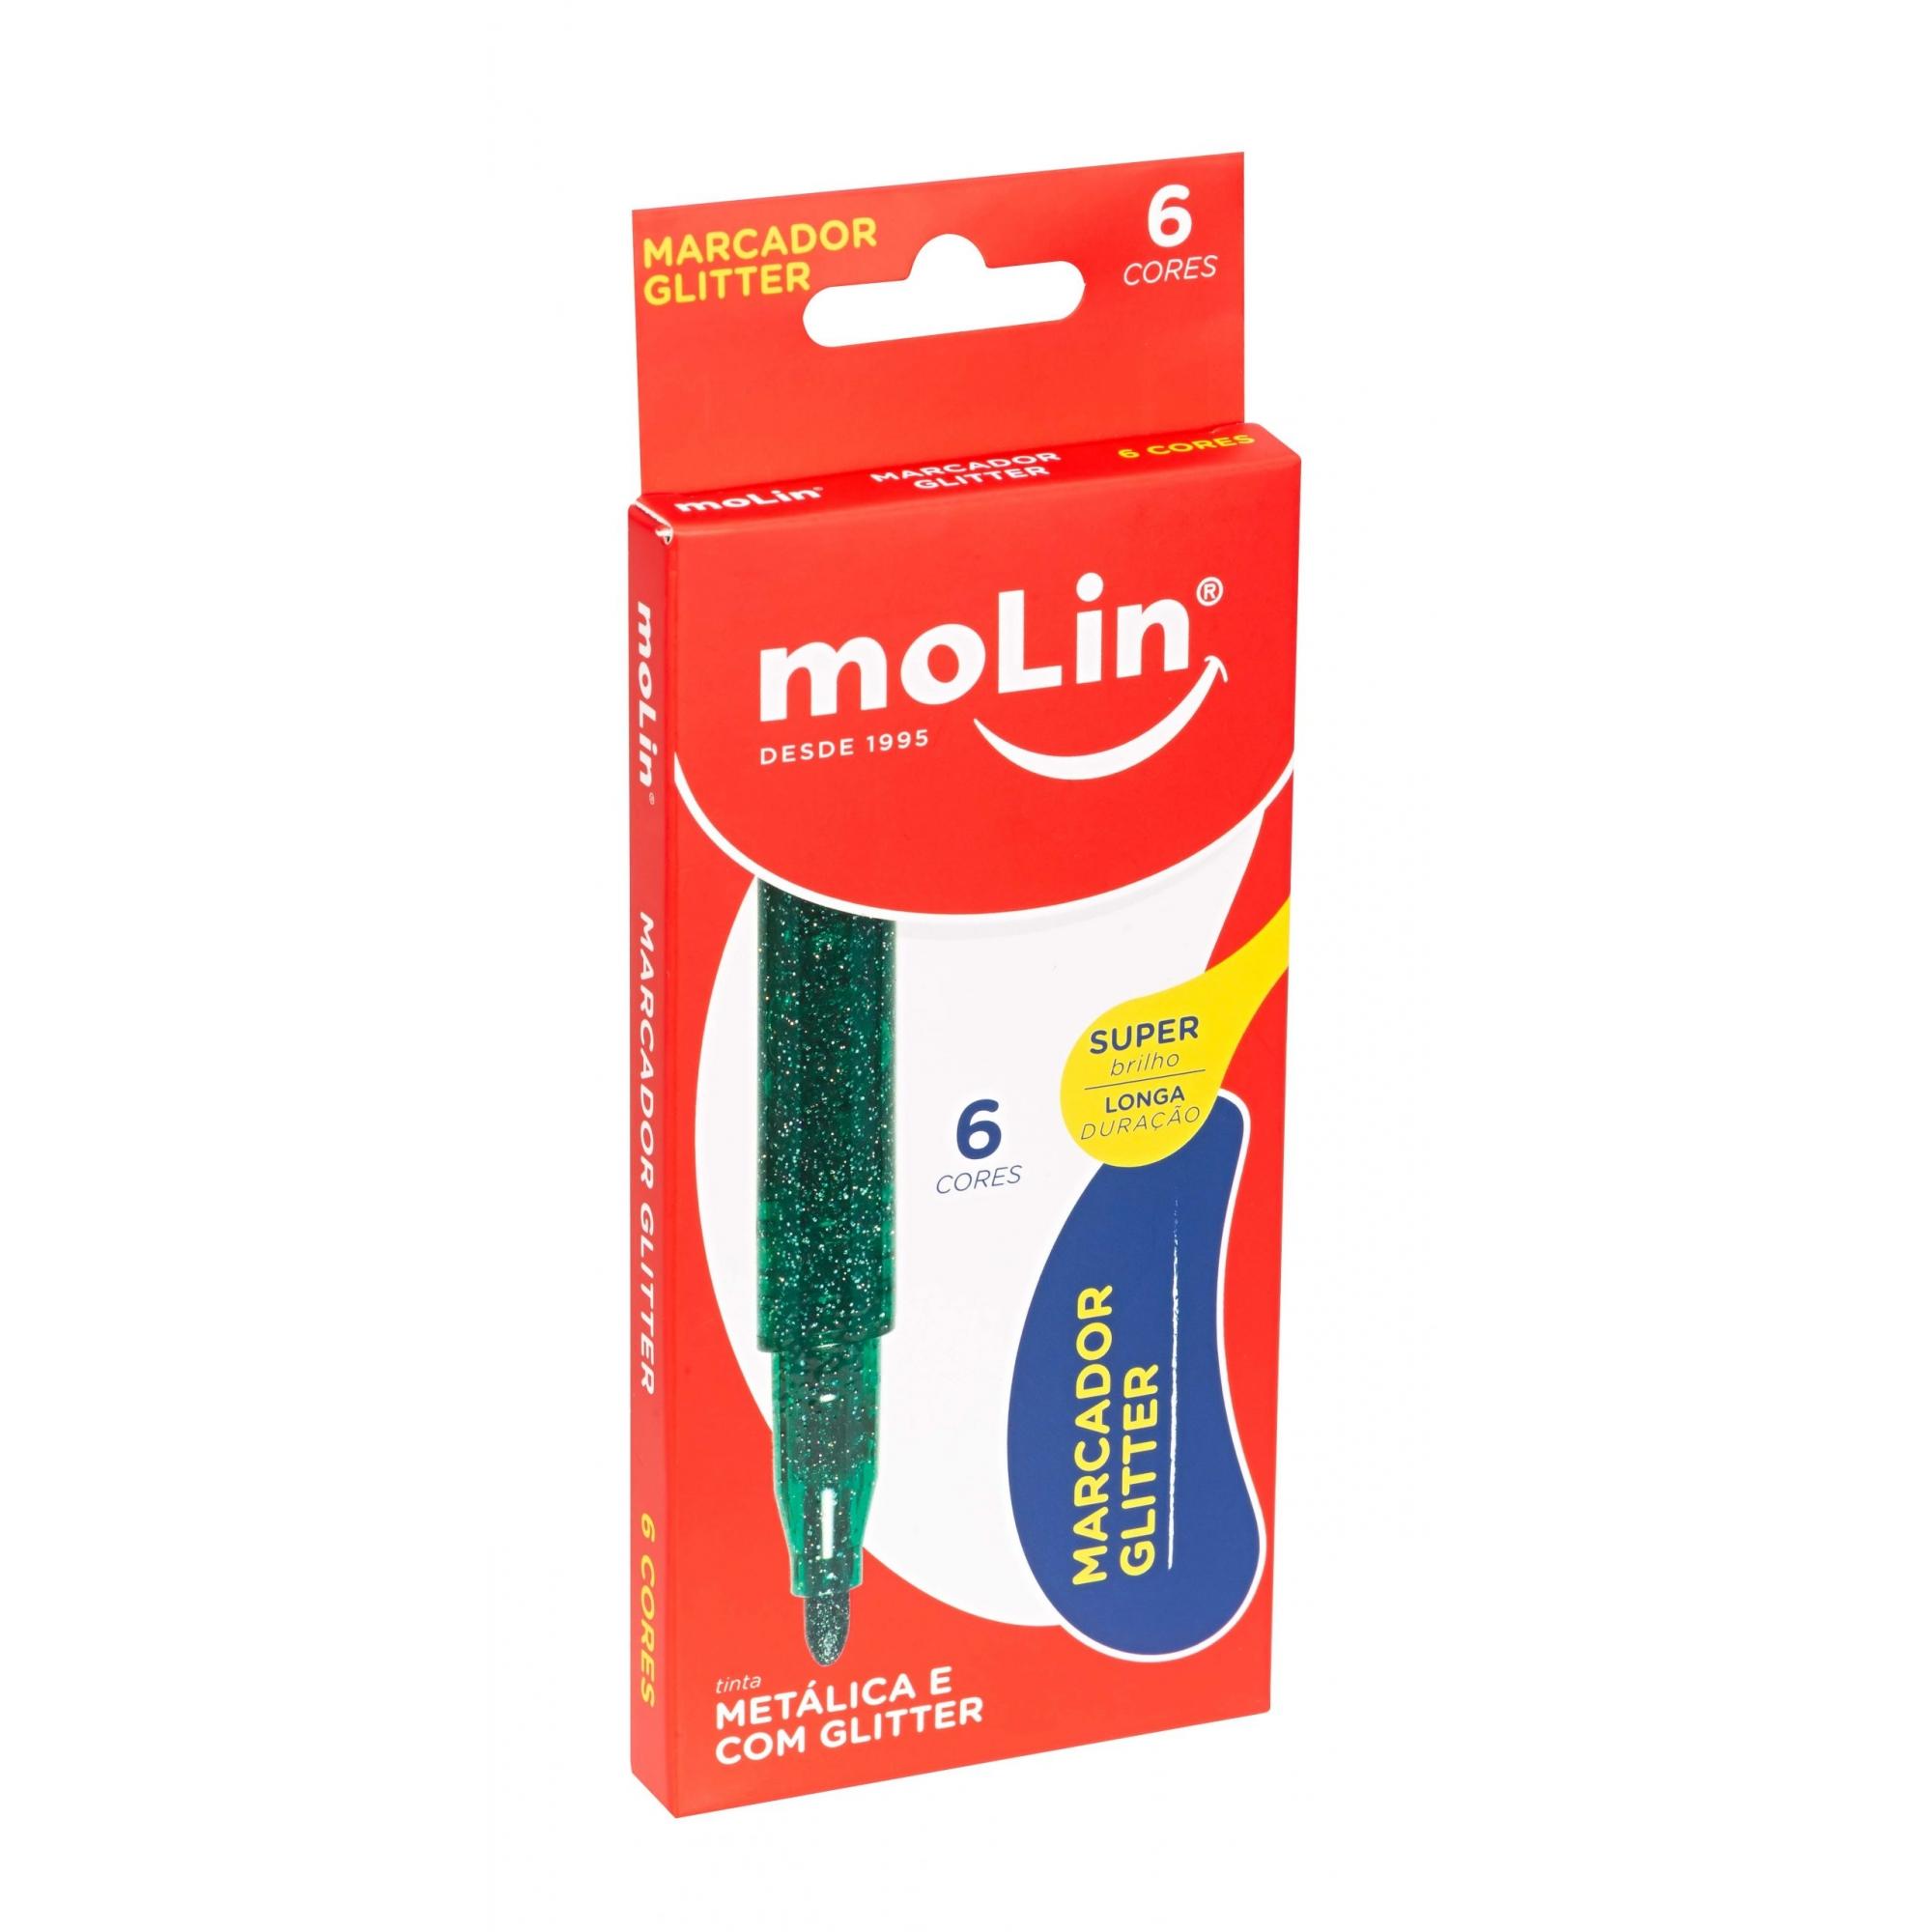 CANETA MARCADOR METALICA COM GLITTER 6 CORES MOLIN